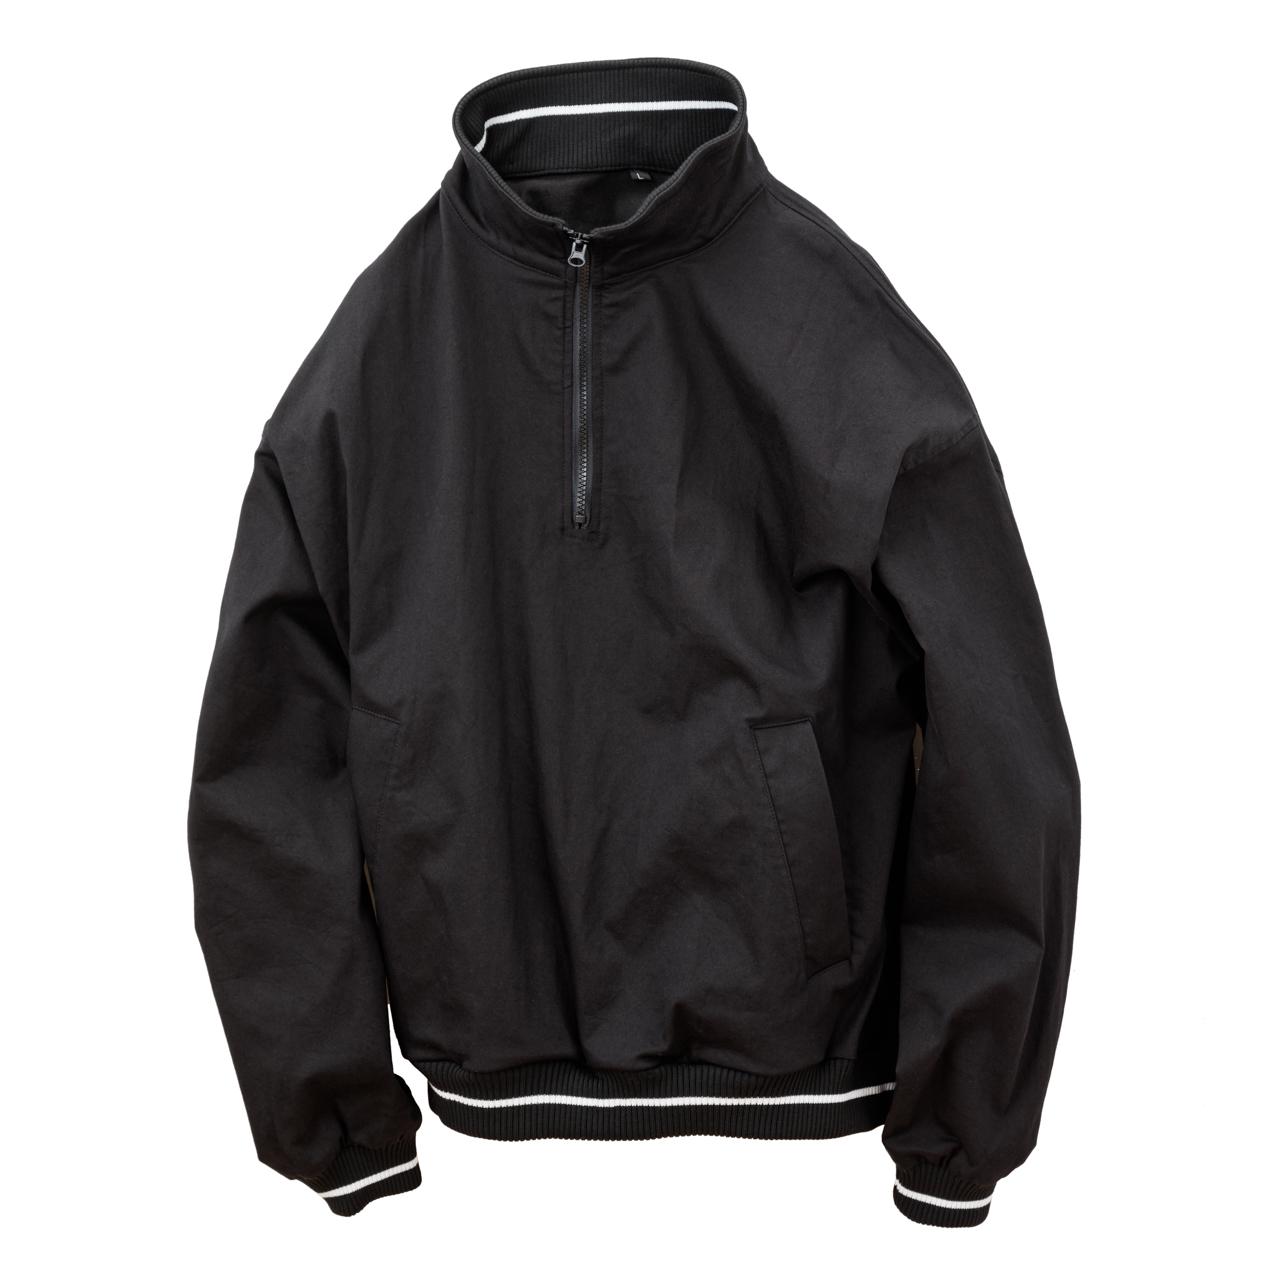 Half Zip Athletic Jacket-Black-